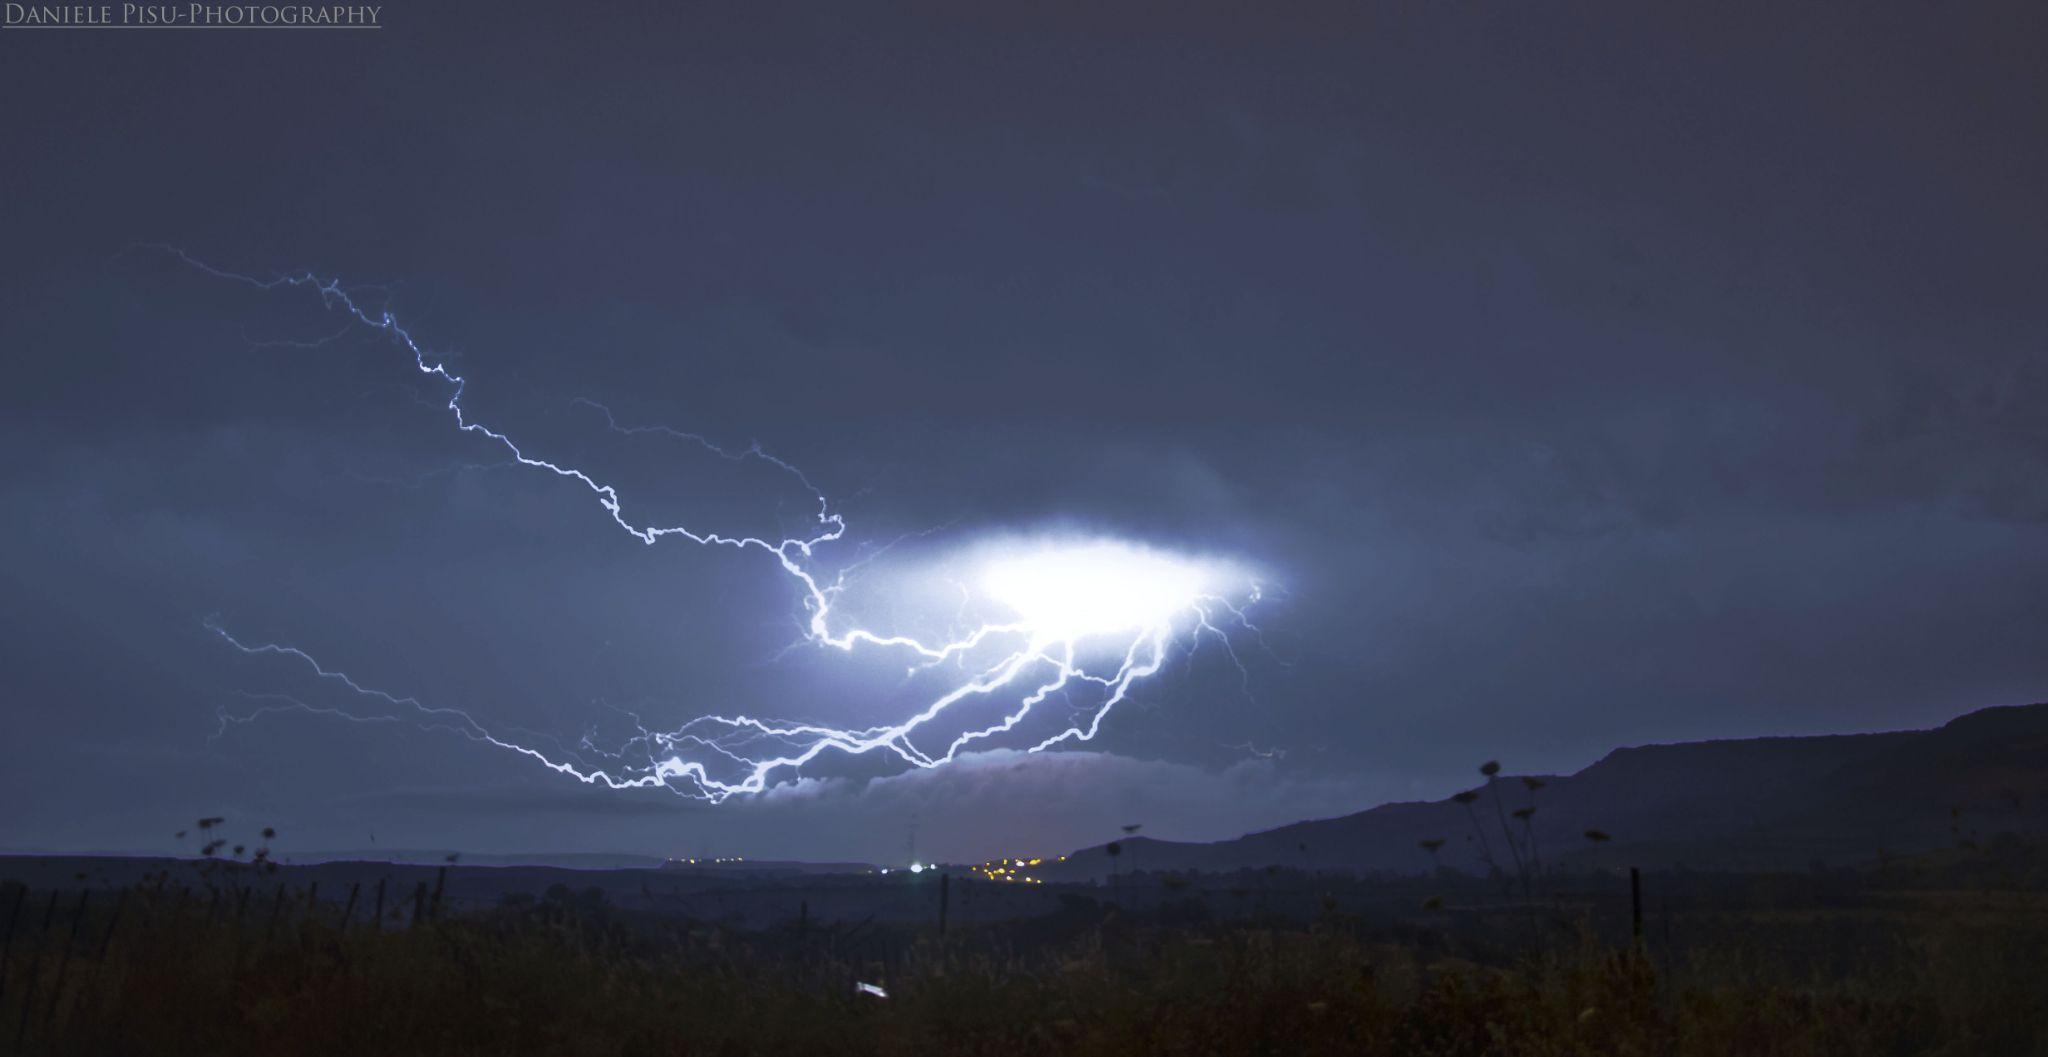 Electric night by Daniele Pisu mellow